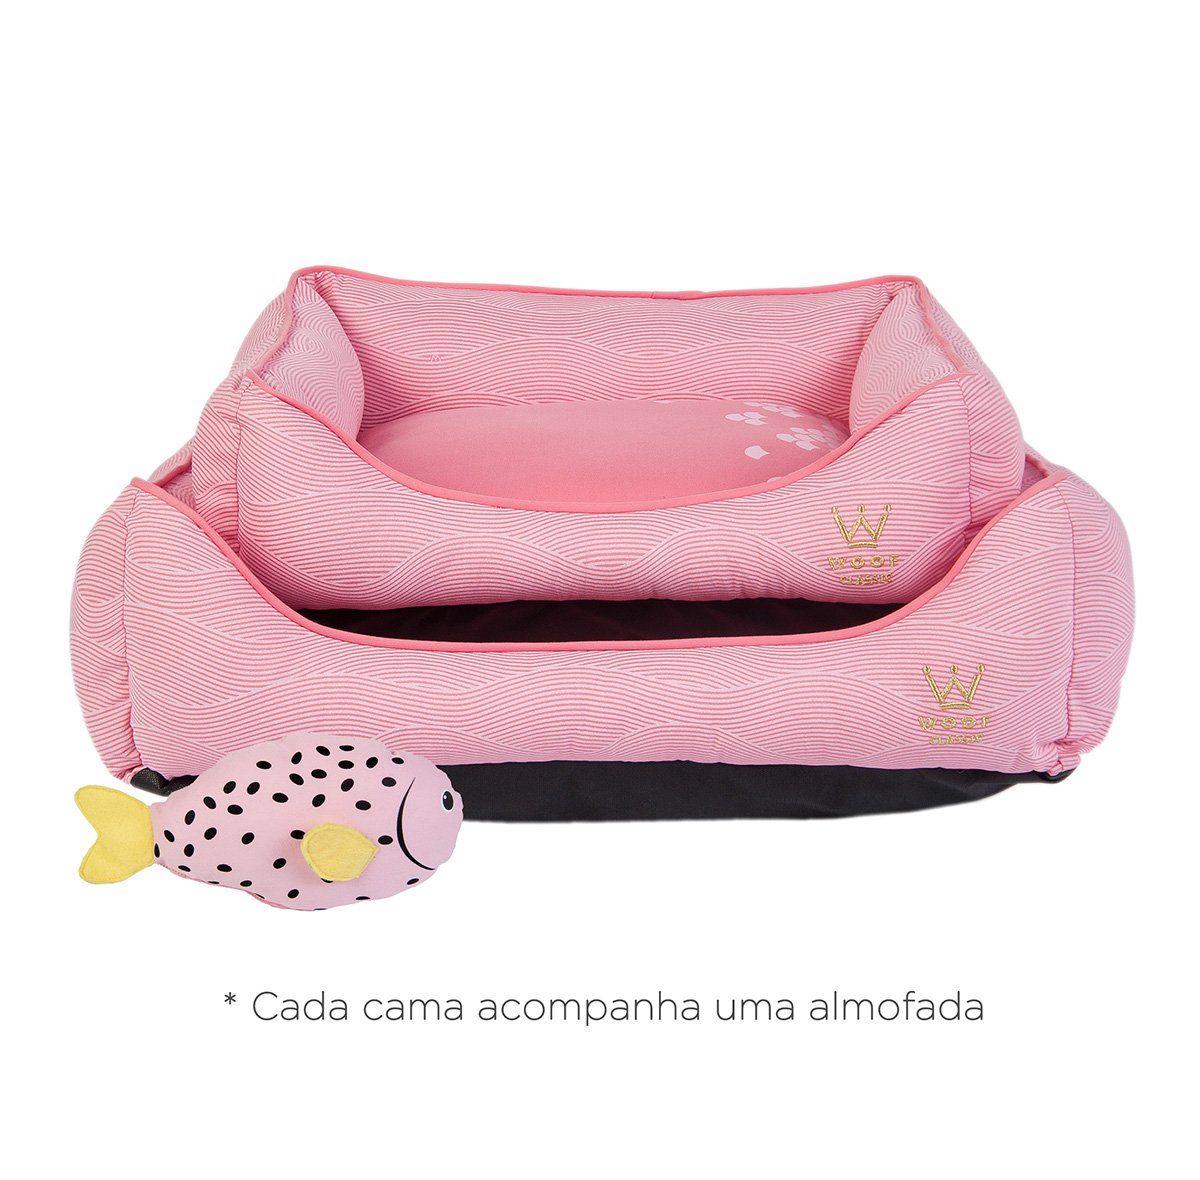 Cama Woof Classic Deep Escamas Rosa - M